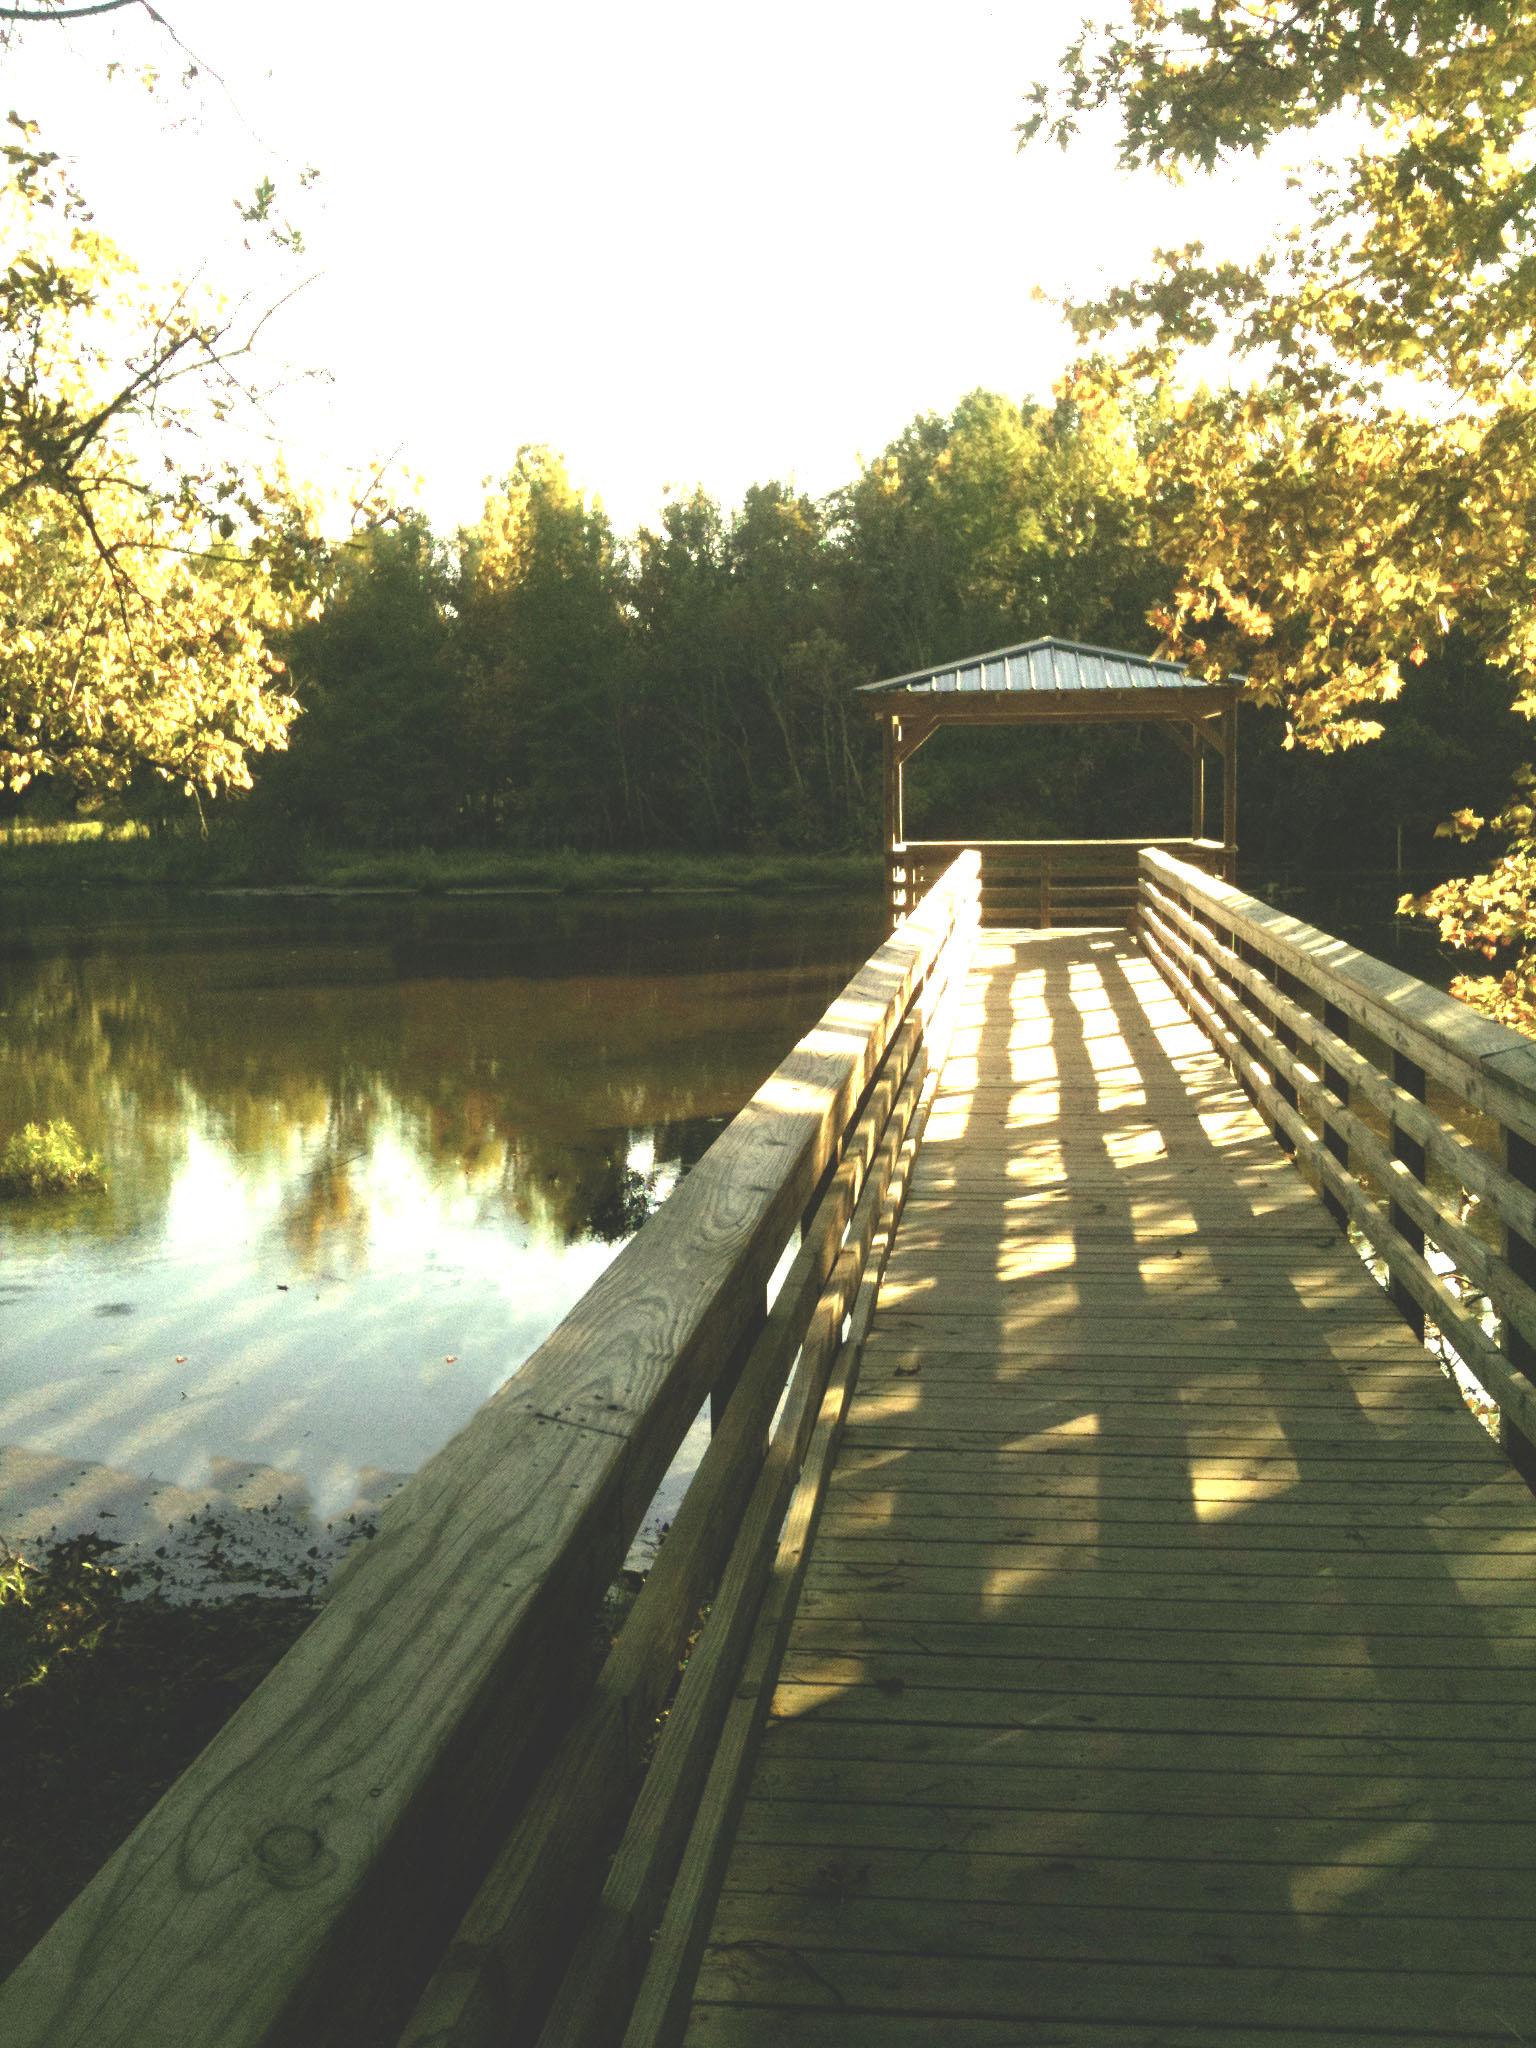 Outdoors photo 1.jpg